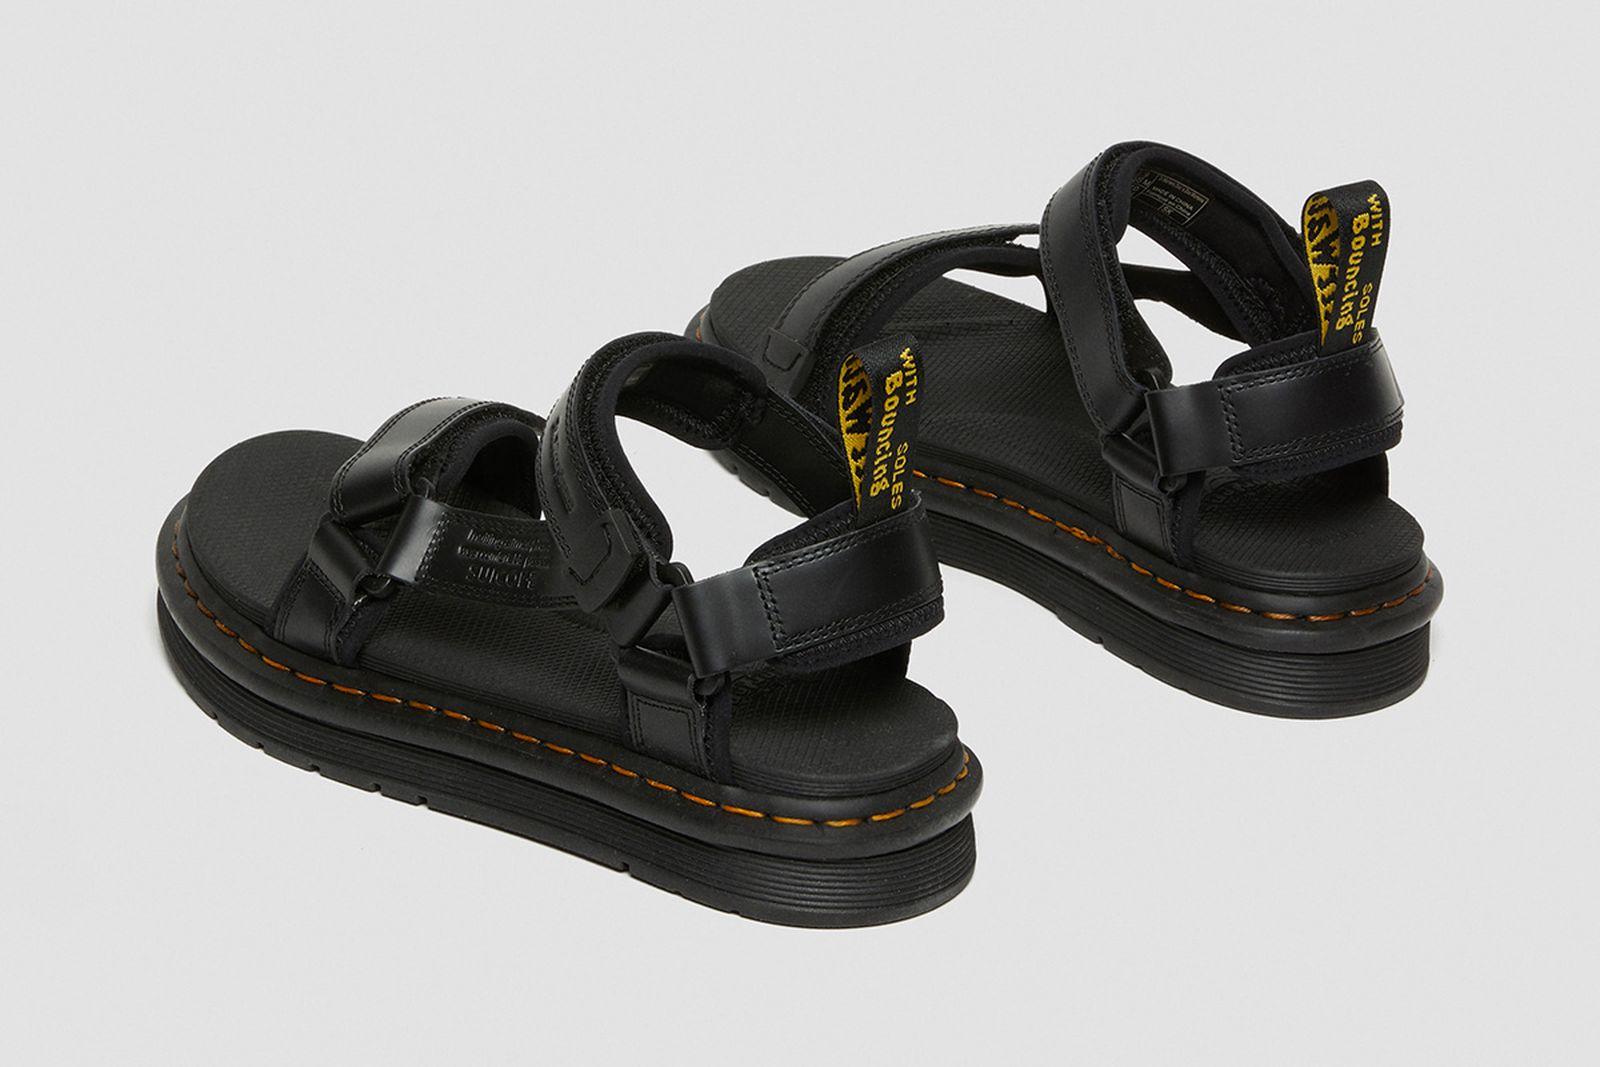 dr-martens-suicoke-sandals-release-date-price-06